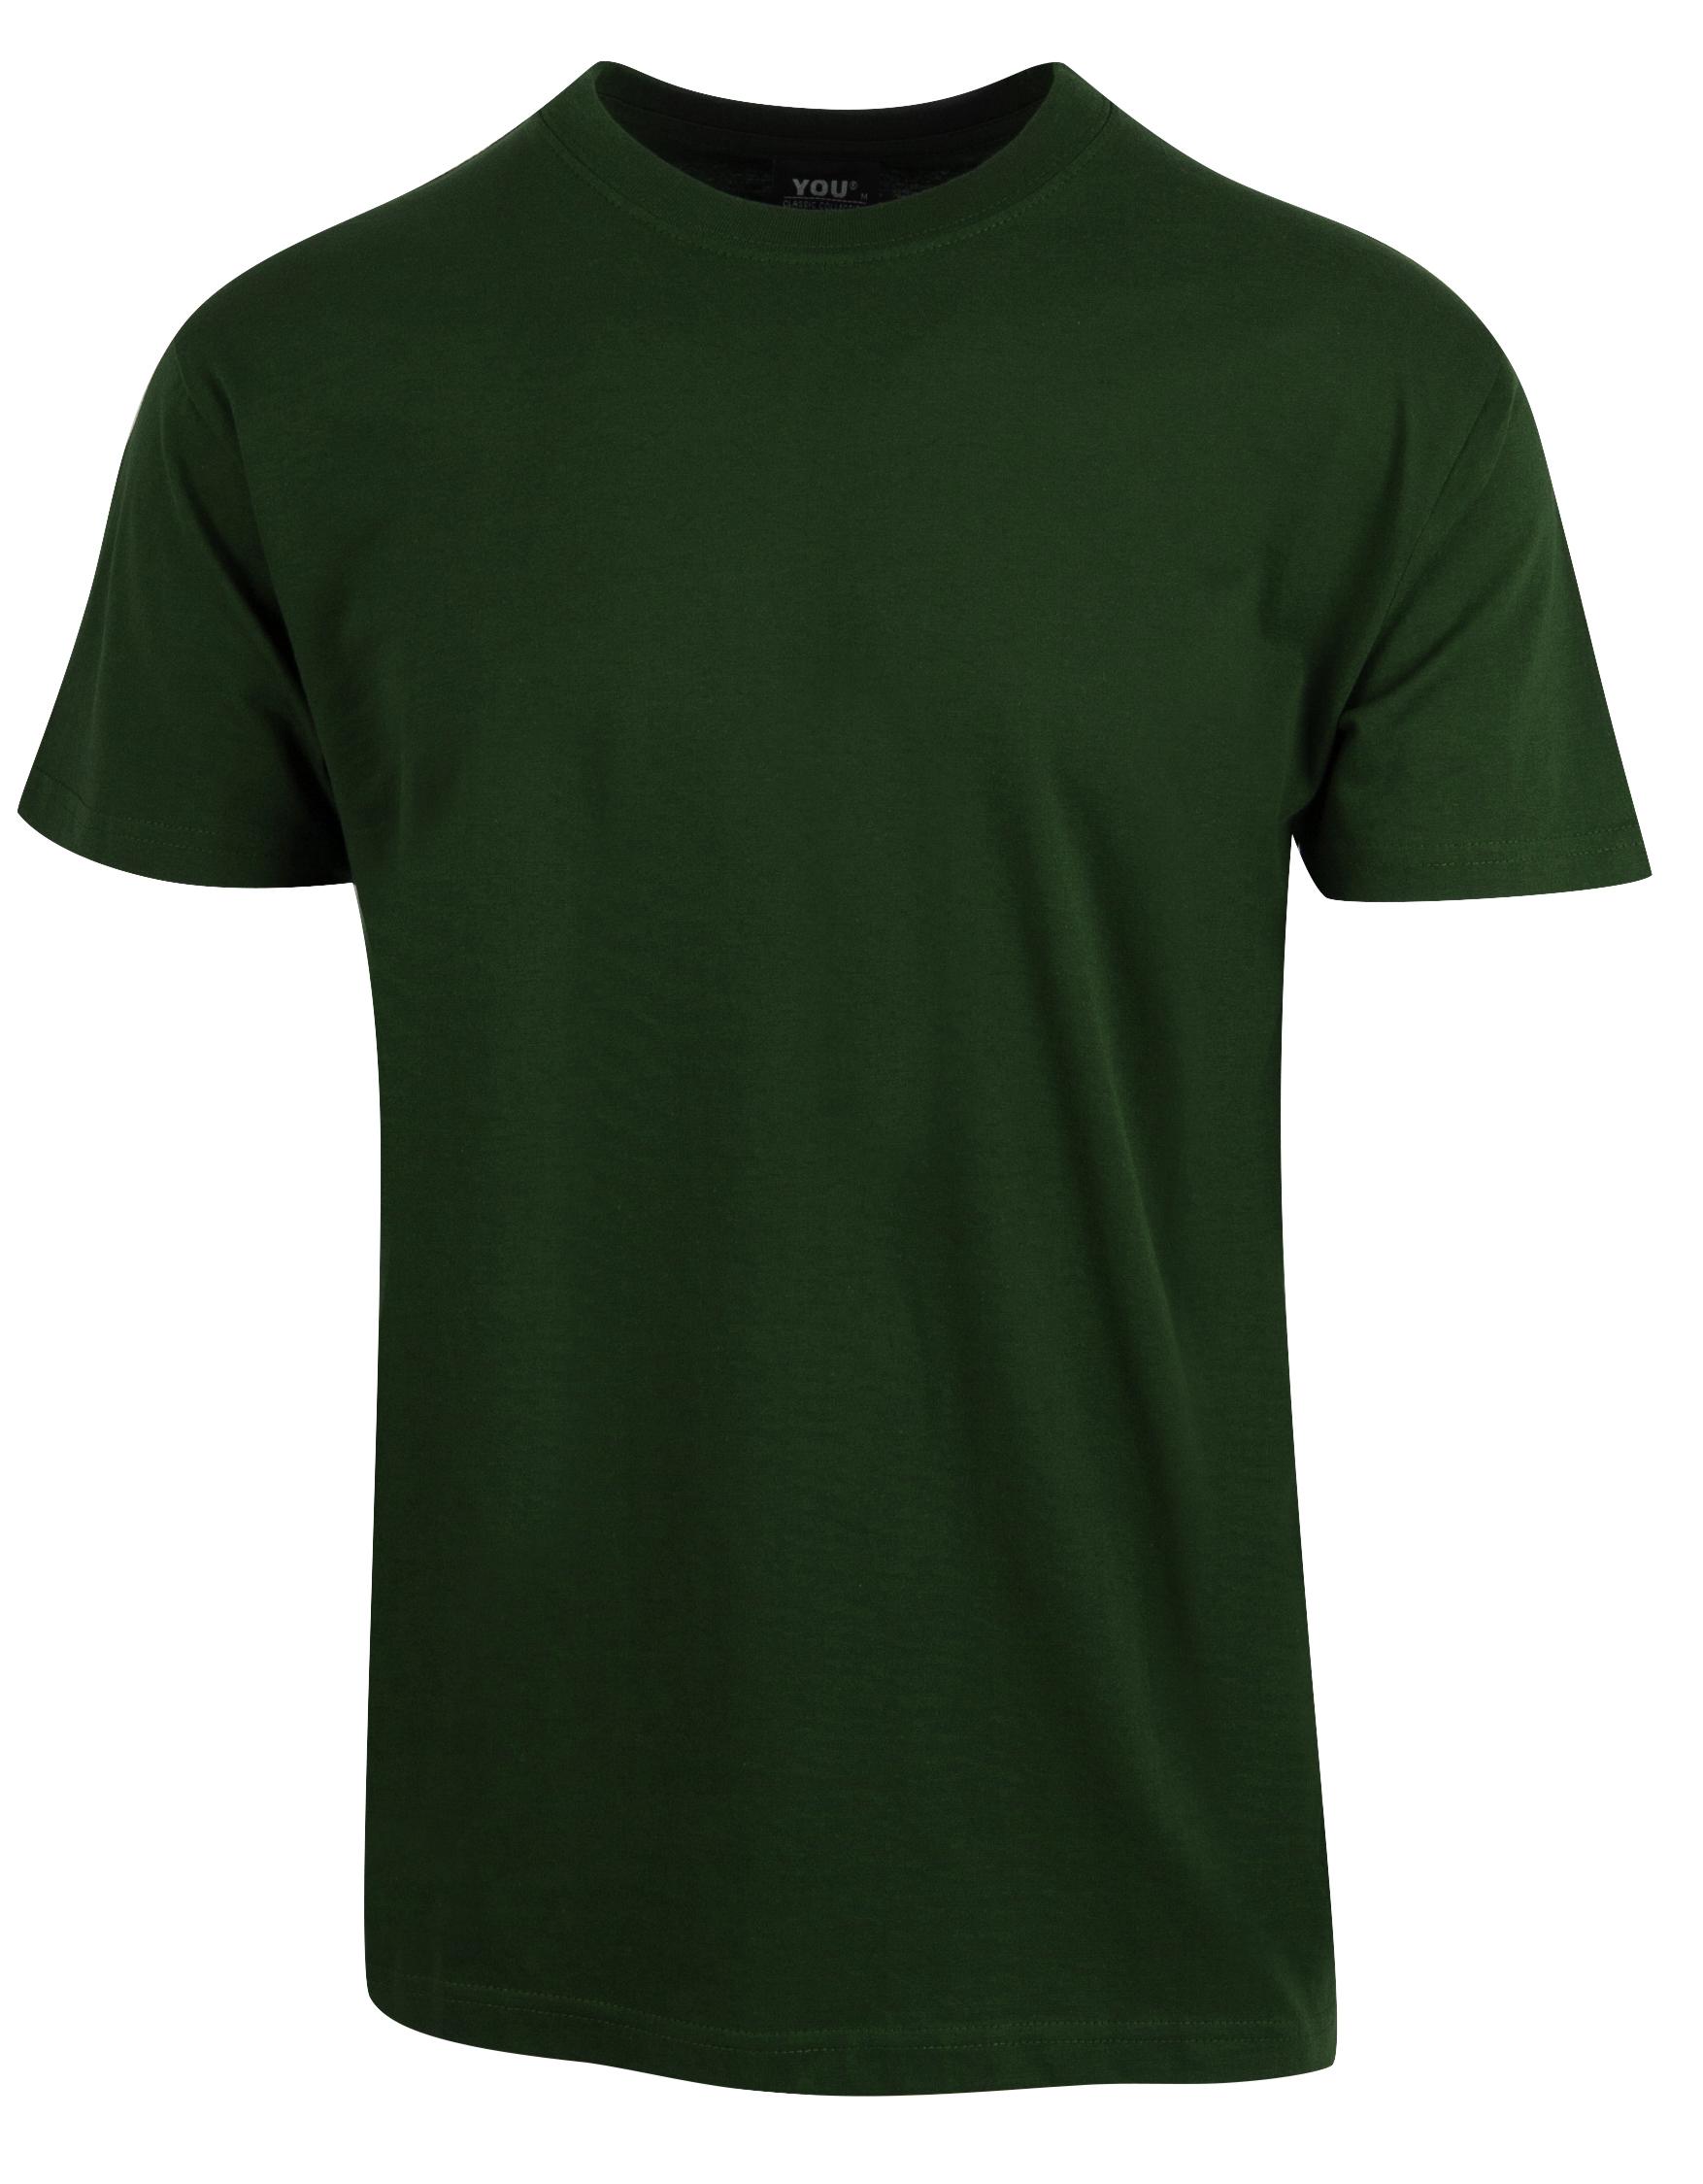 88c789d6 GSV T-skjorte Grønn (ny logo) - Gammalsaabens Venner